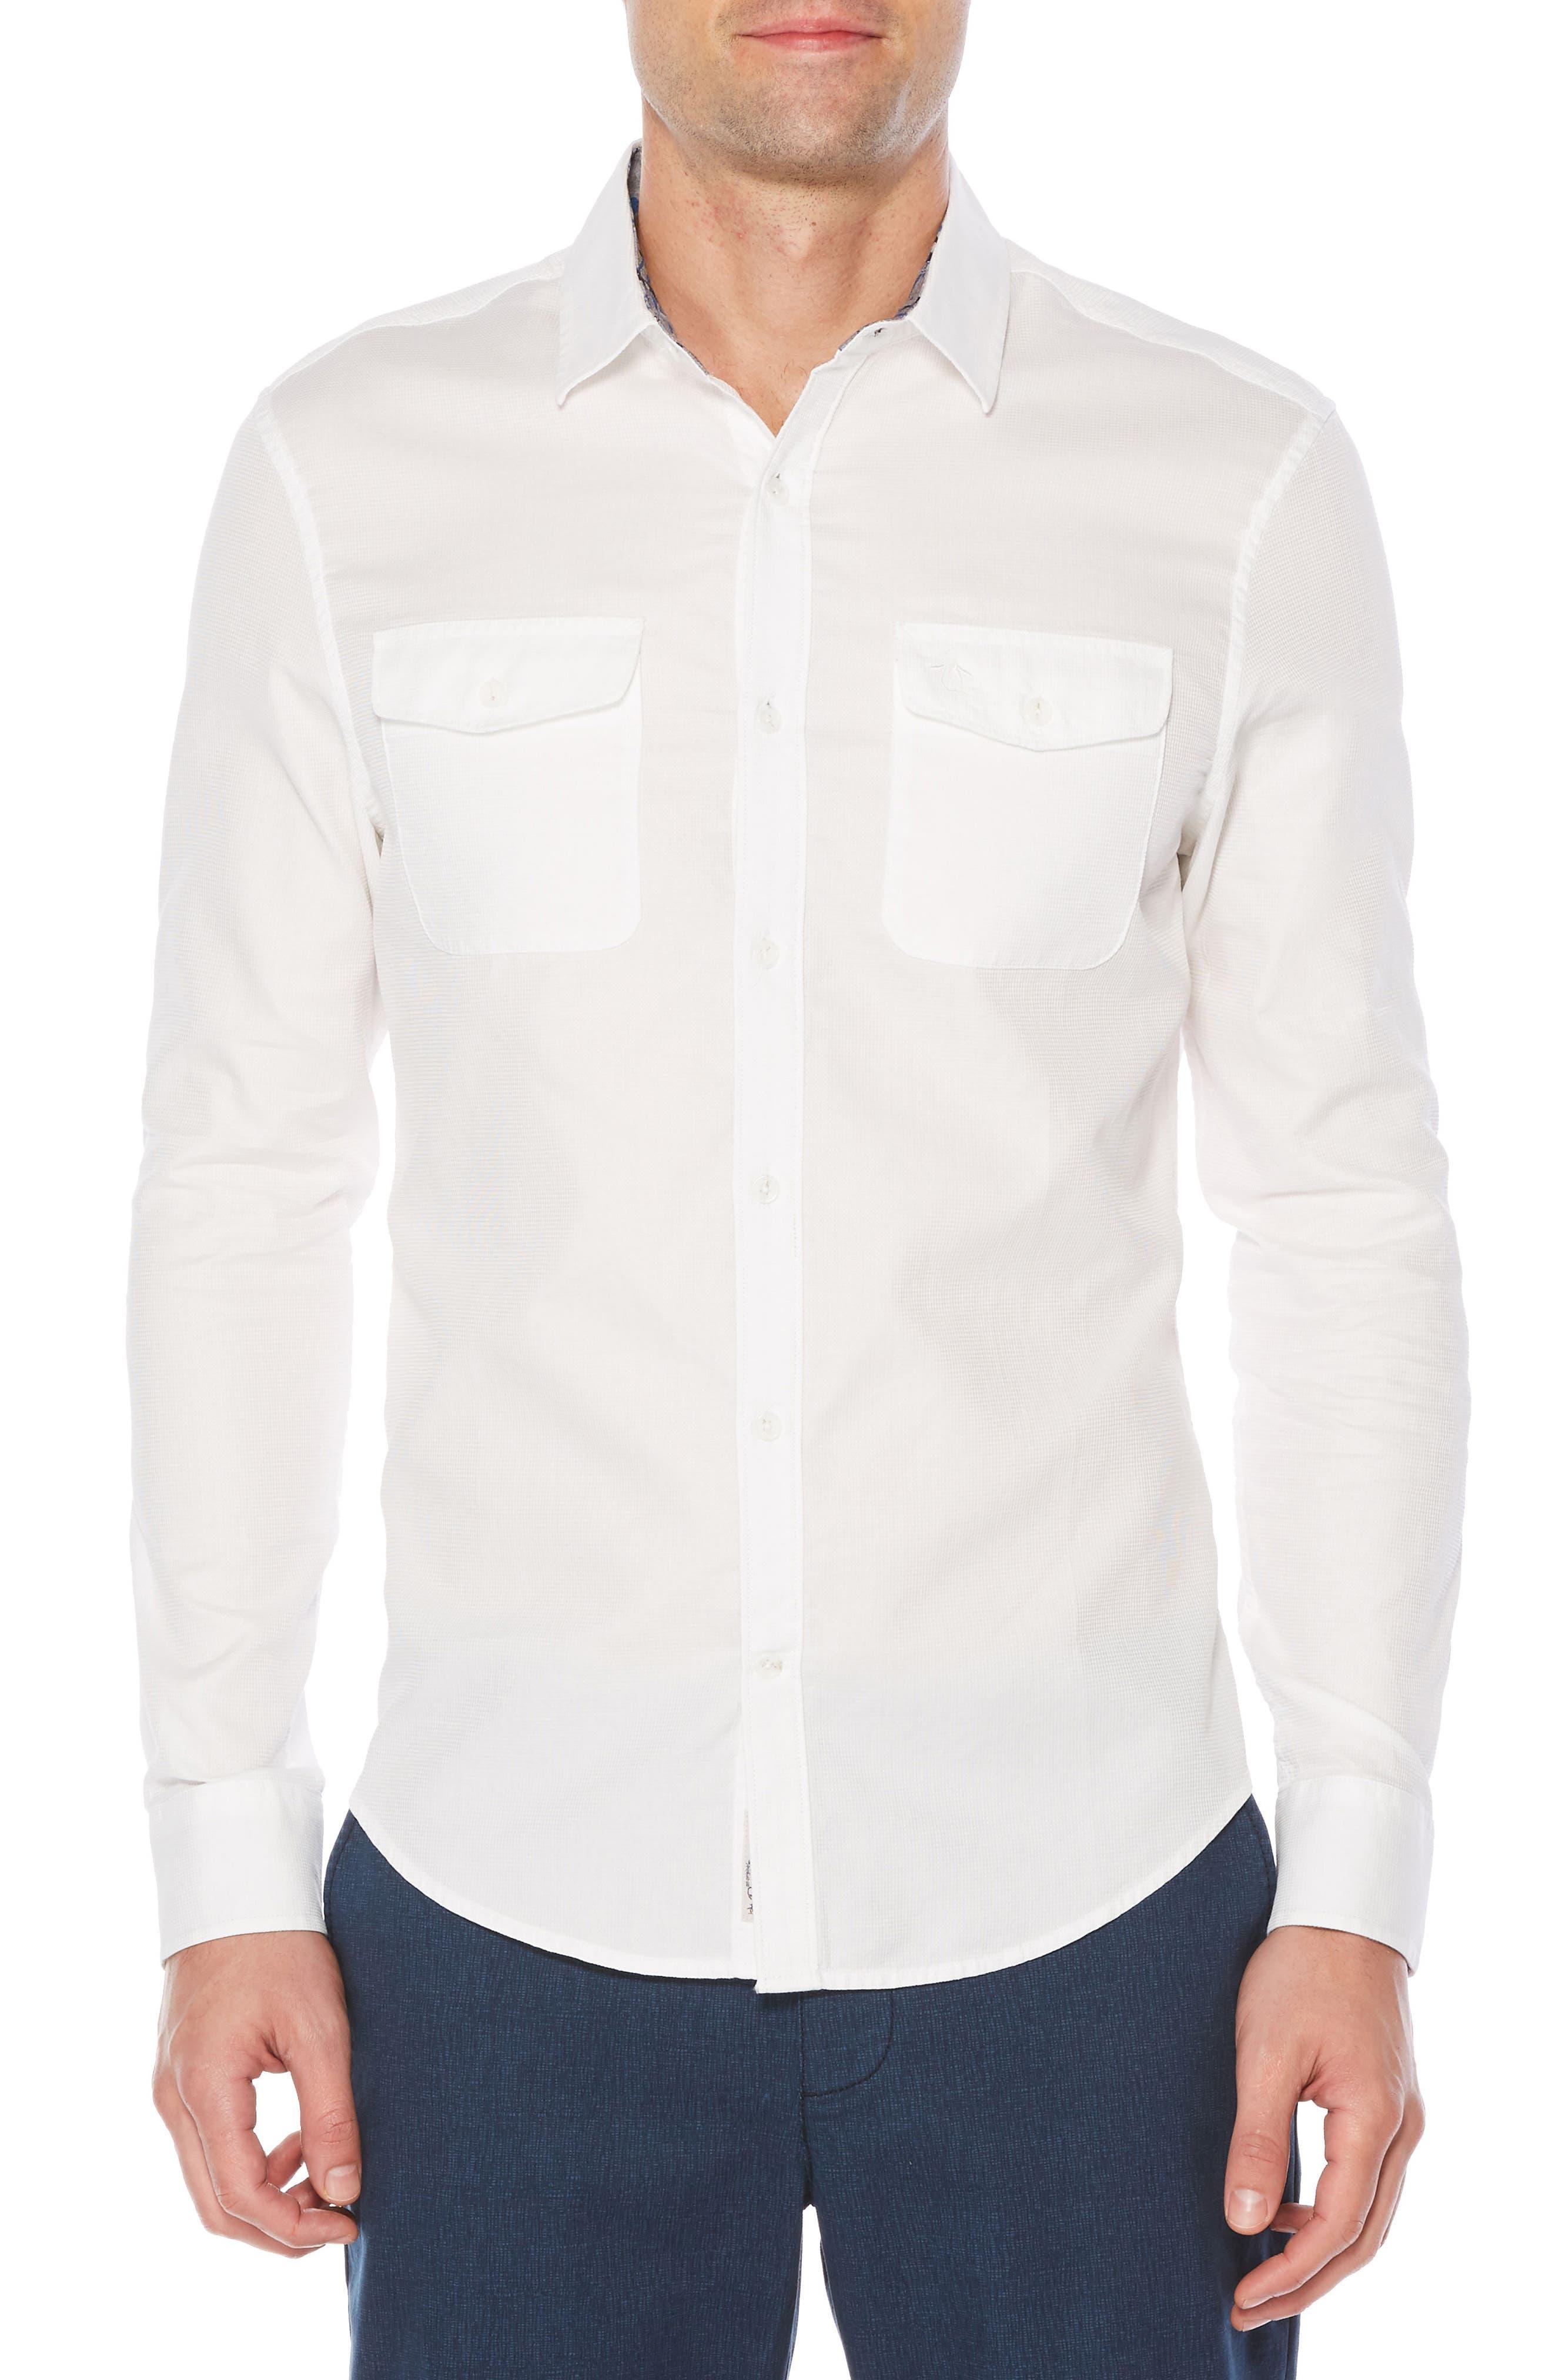 Alternate Image 1 Selected - Original Penguin Woven Shirt